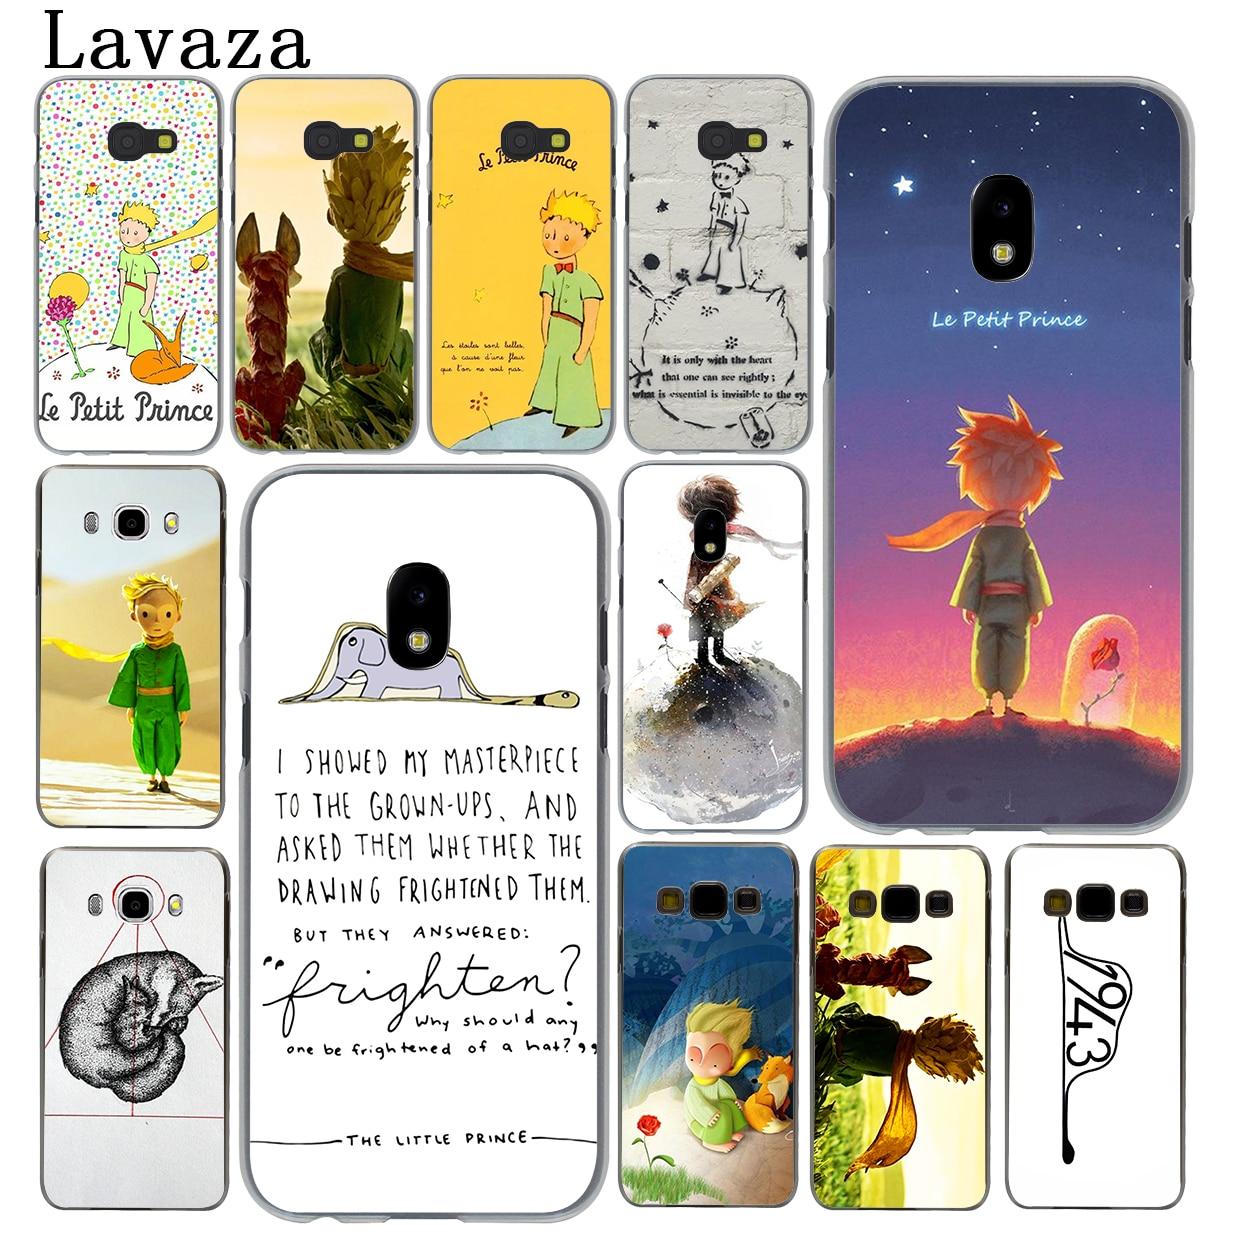 Lavaza The little prince Rose fox Hard Phone Case for Samsung Galaxy J5 J1 J2 J3 J7 2017 2016 2015 2018 J3 J5 Prime Cover